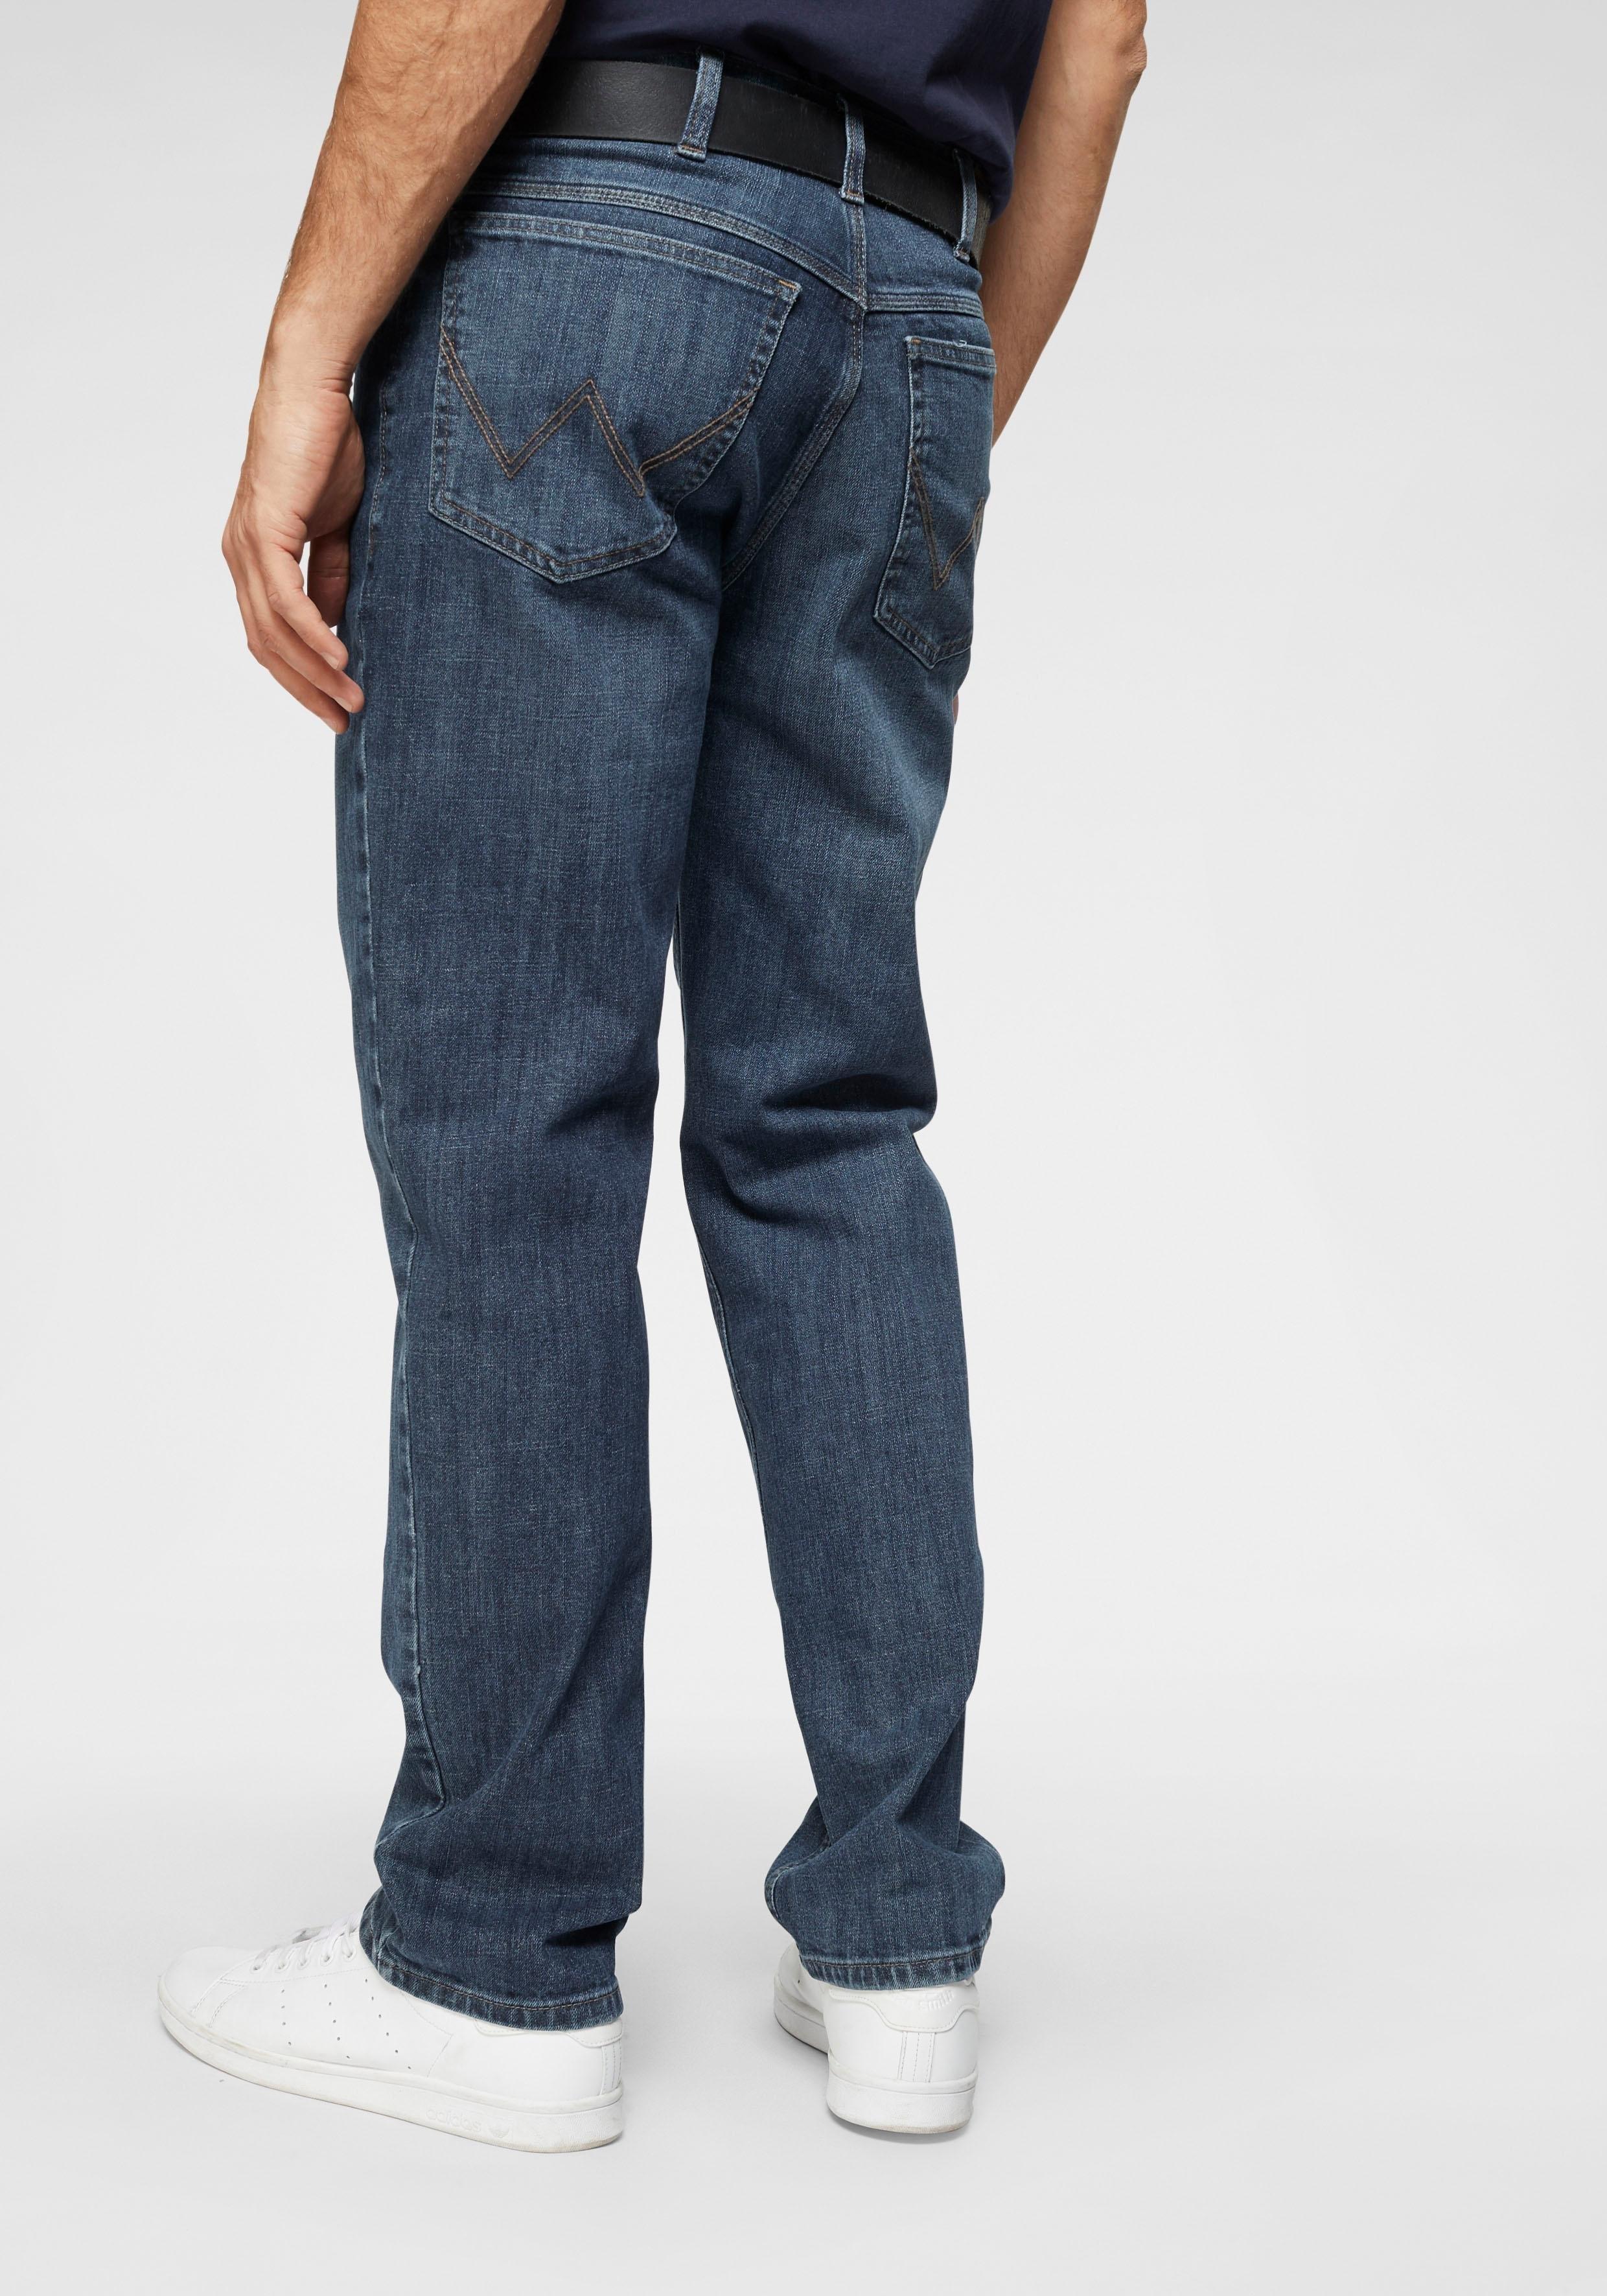 Wrangler straight jeans »Authentic Straight« voordelig en veilig online kopen